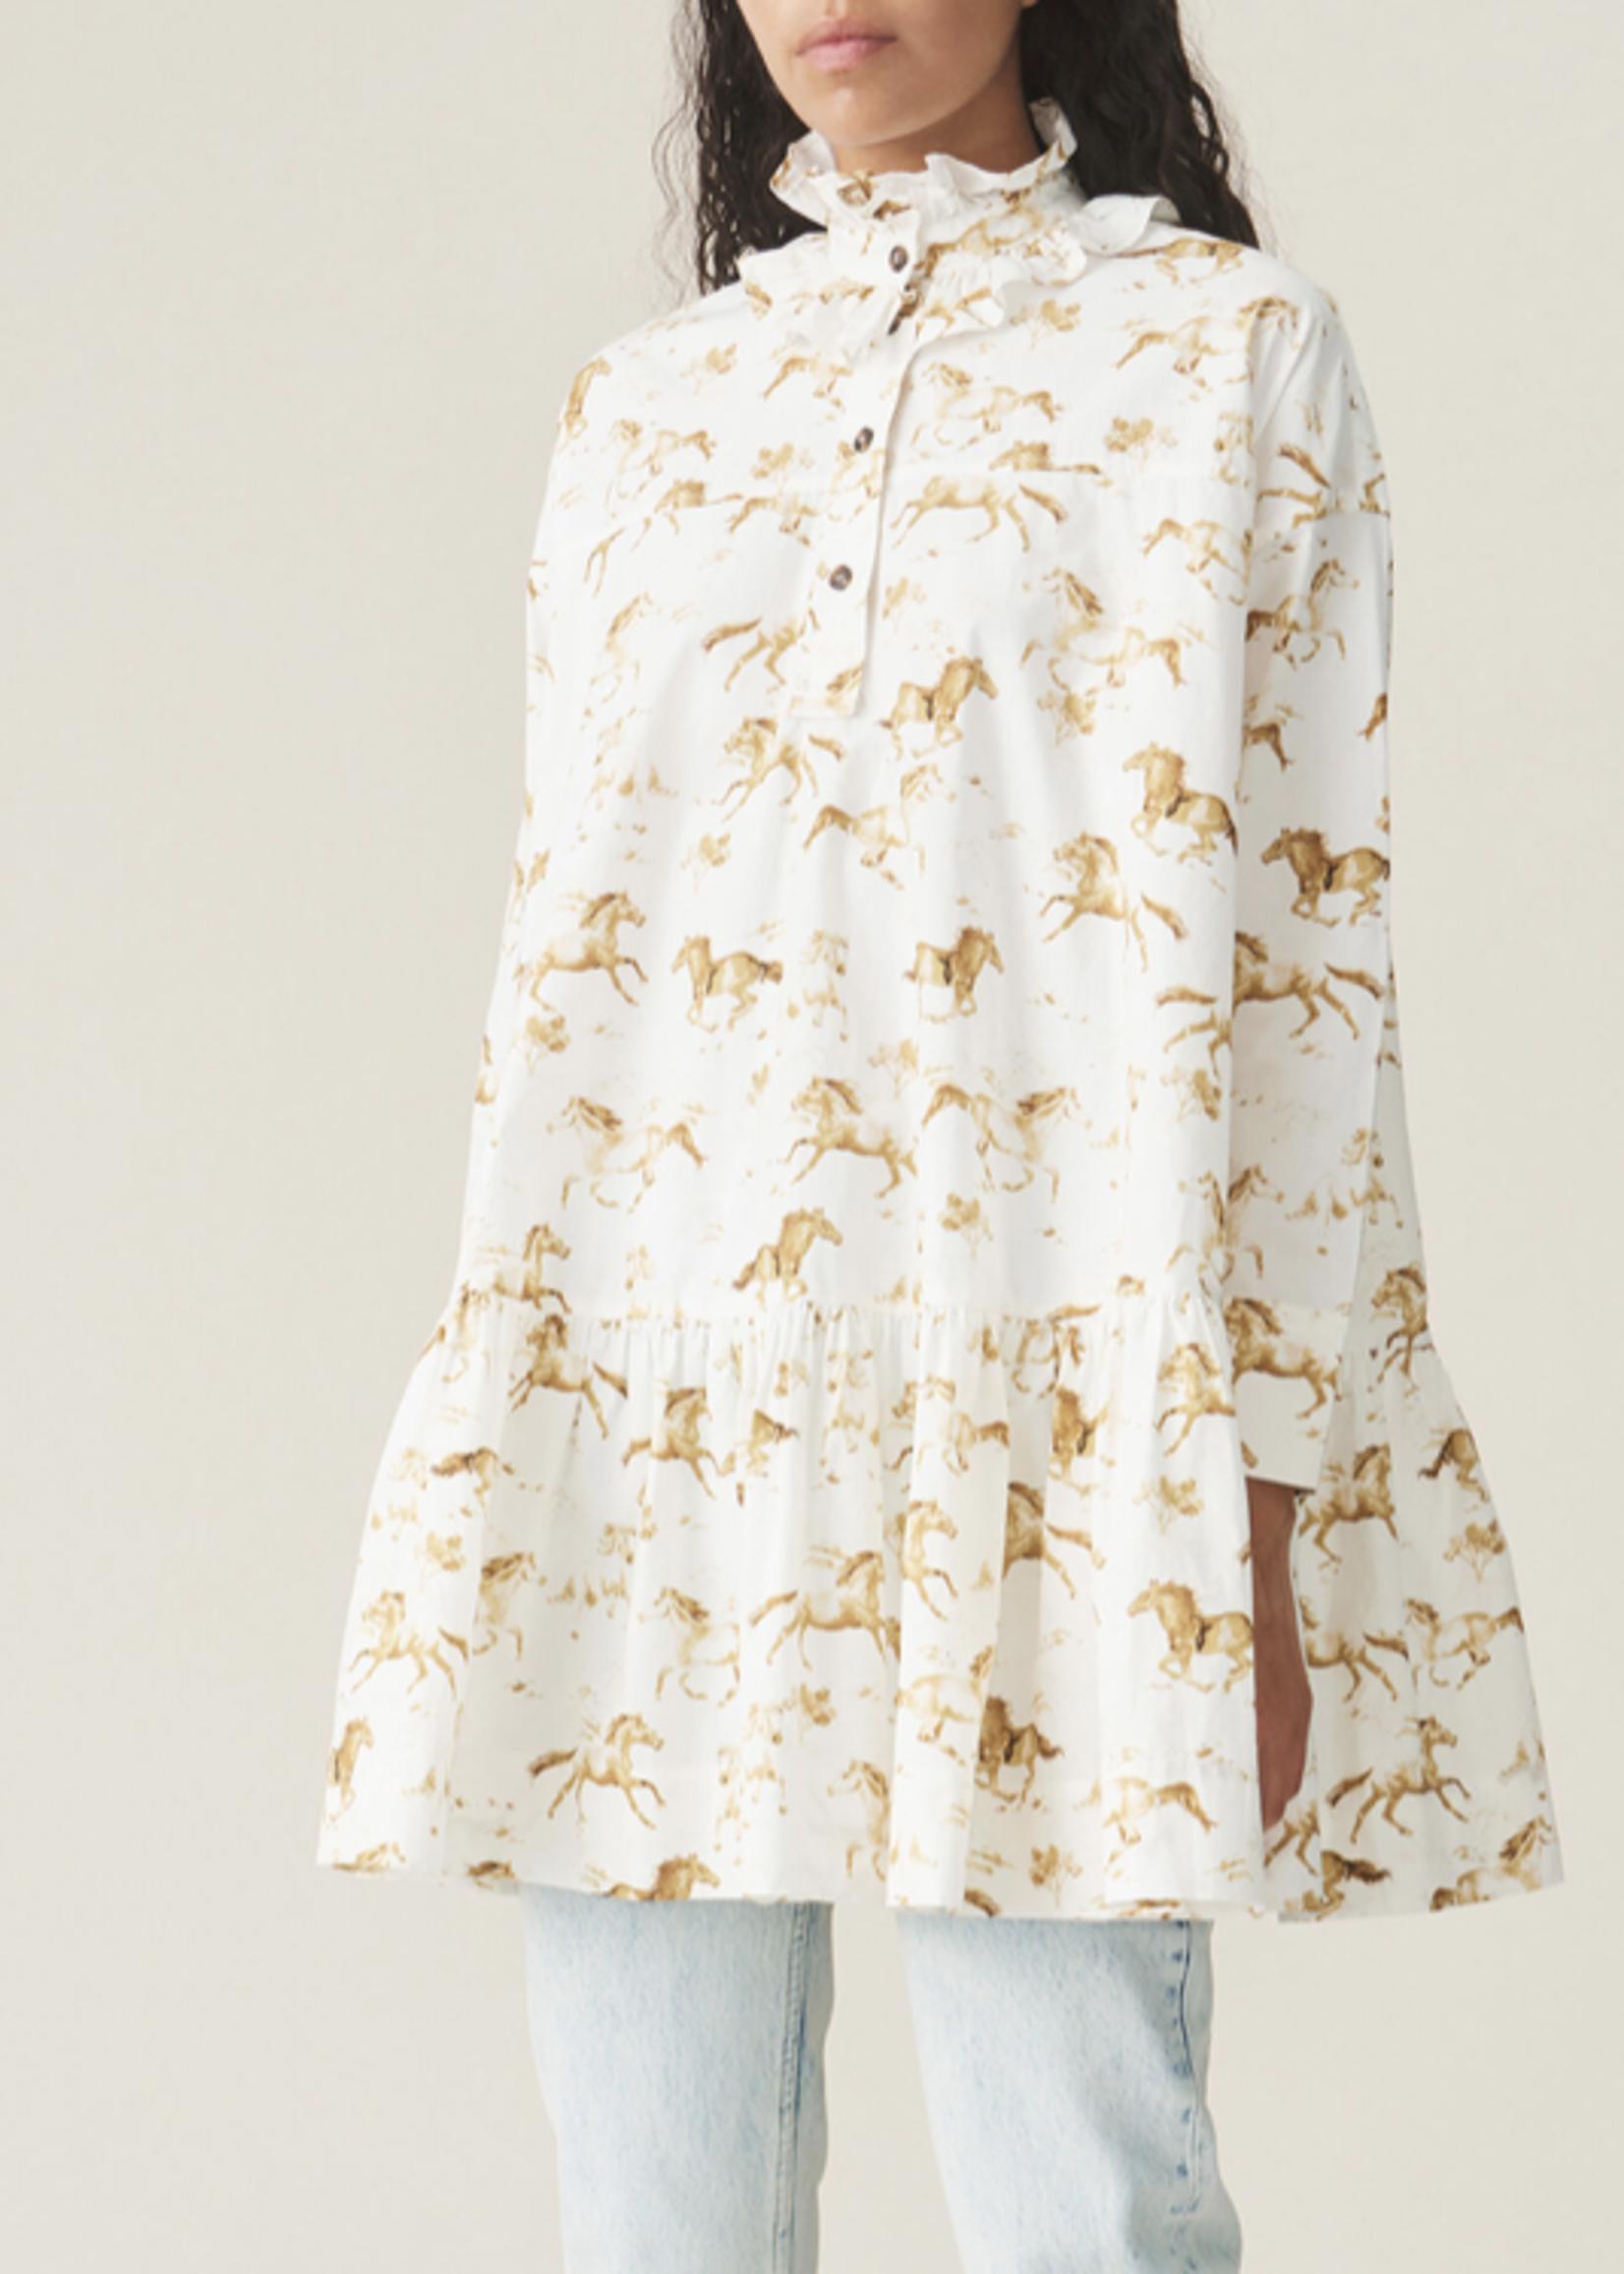 GANNI Oversized Dress with Horses Print